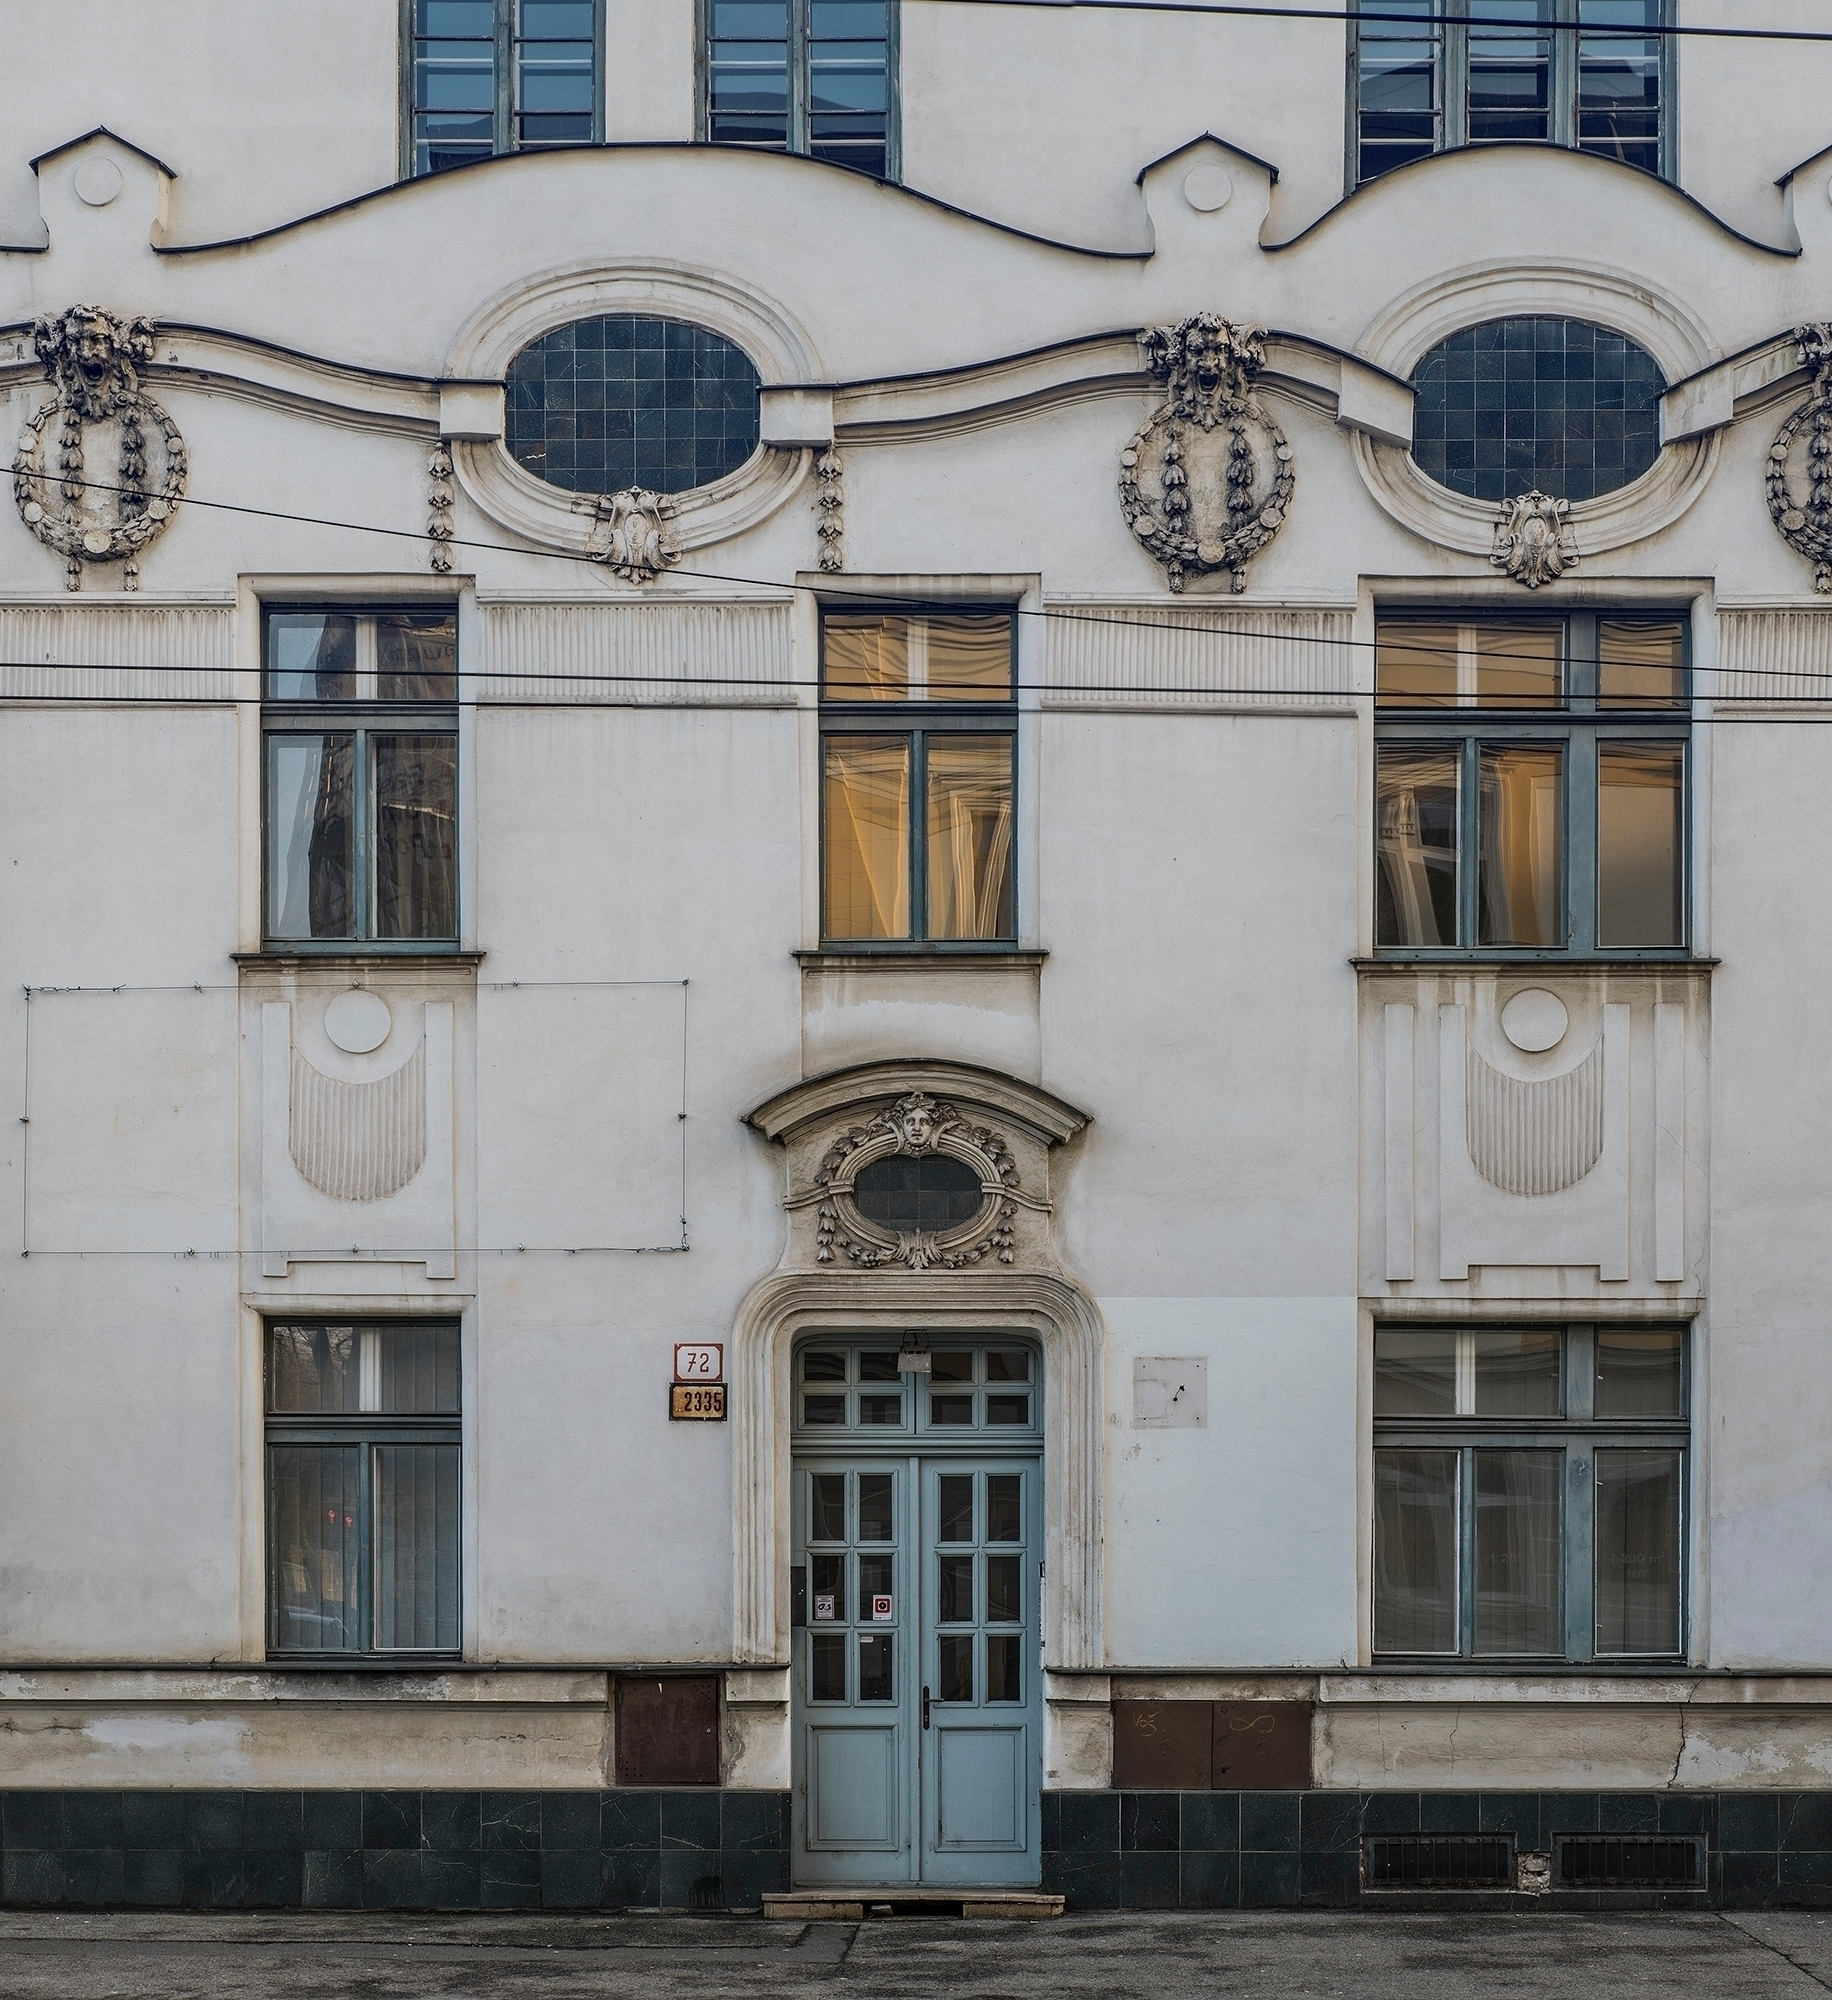 beautiful buildings city centre - forgottenheritage   ello